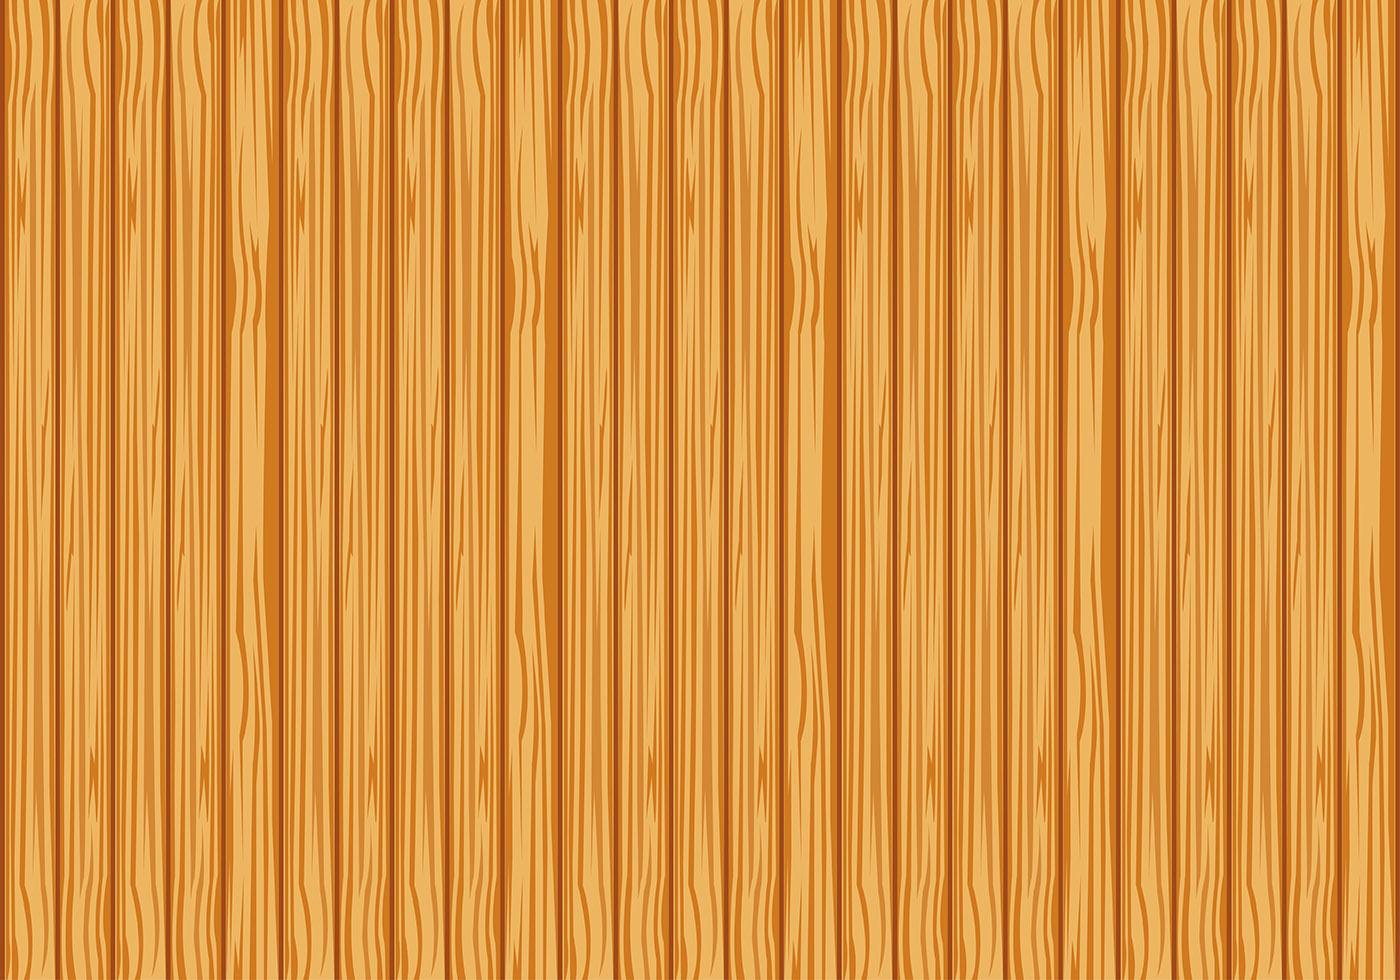 Flooring Designs Laminate Floor Background With Wooden Texture Download